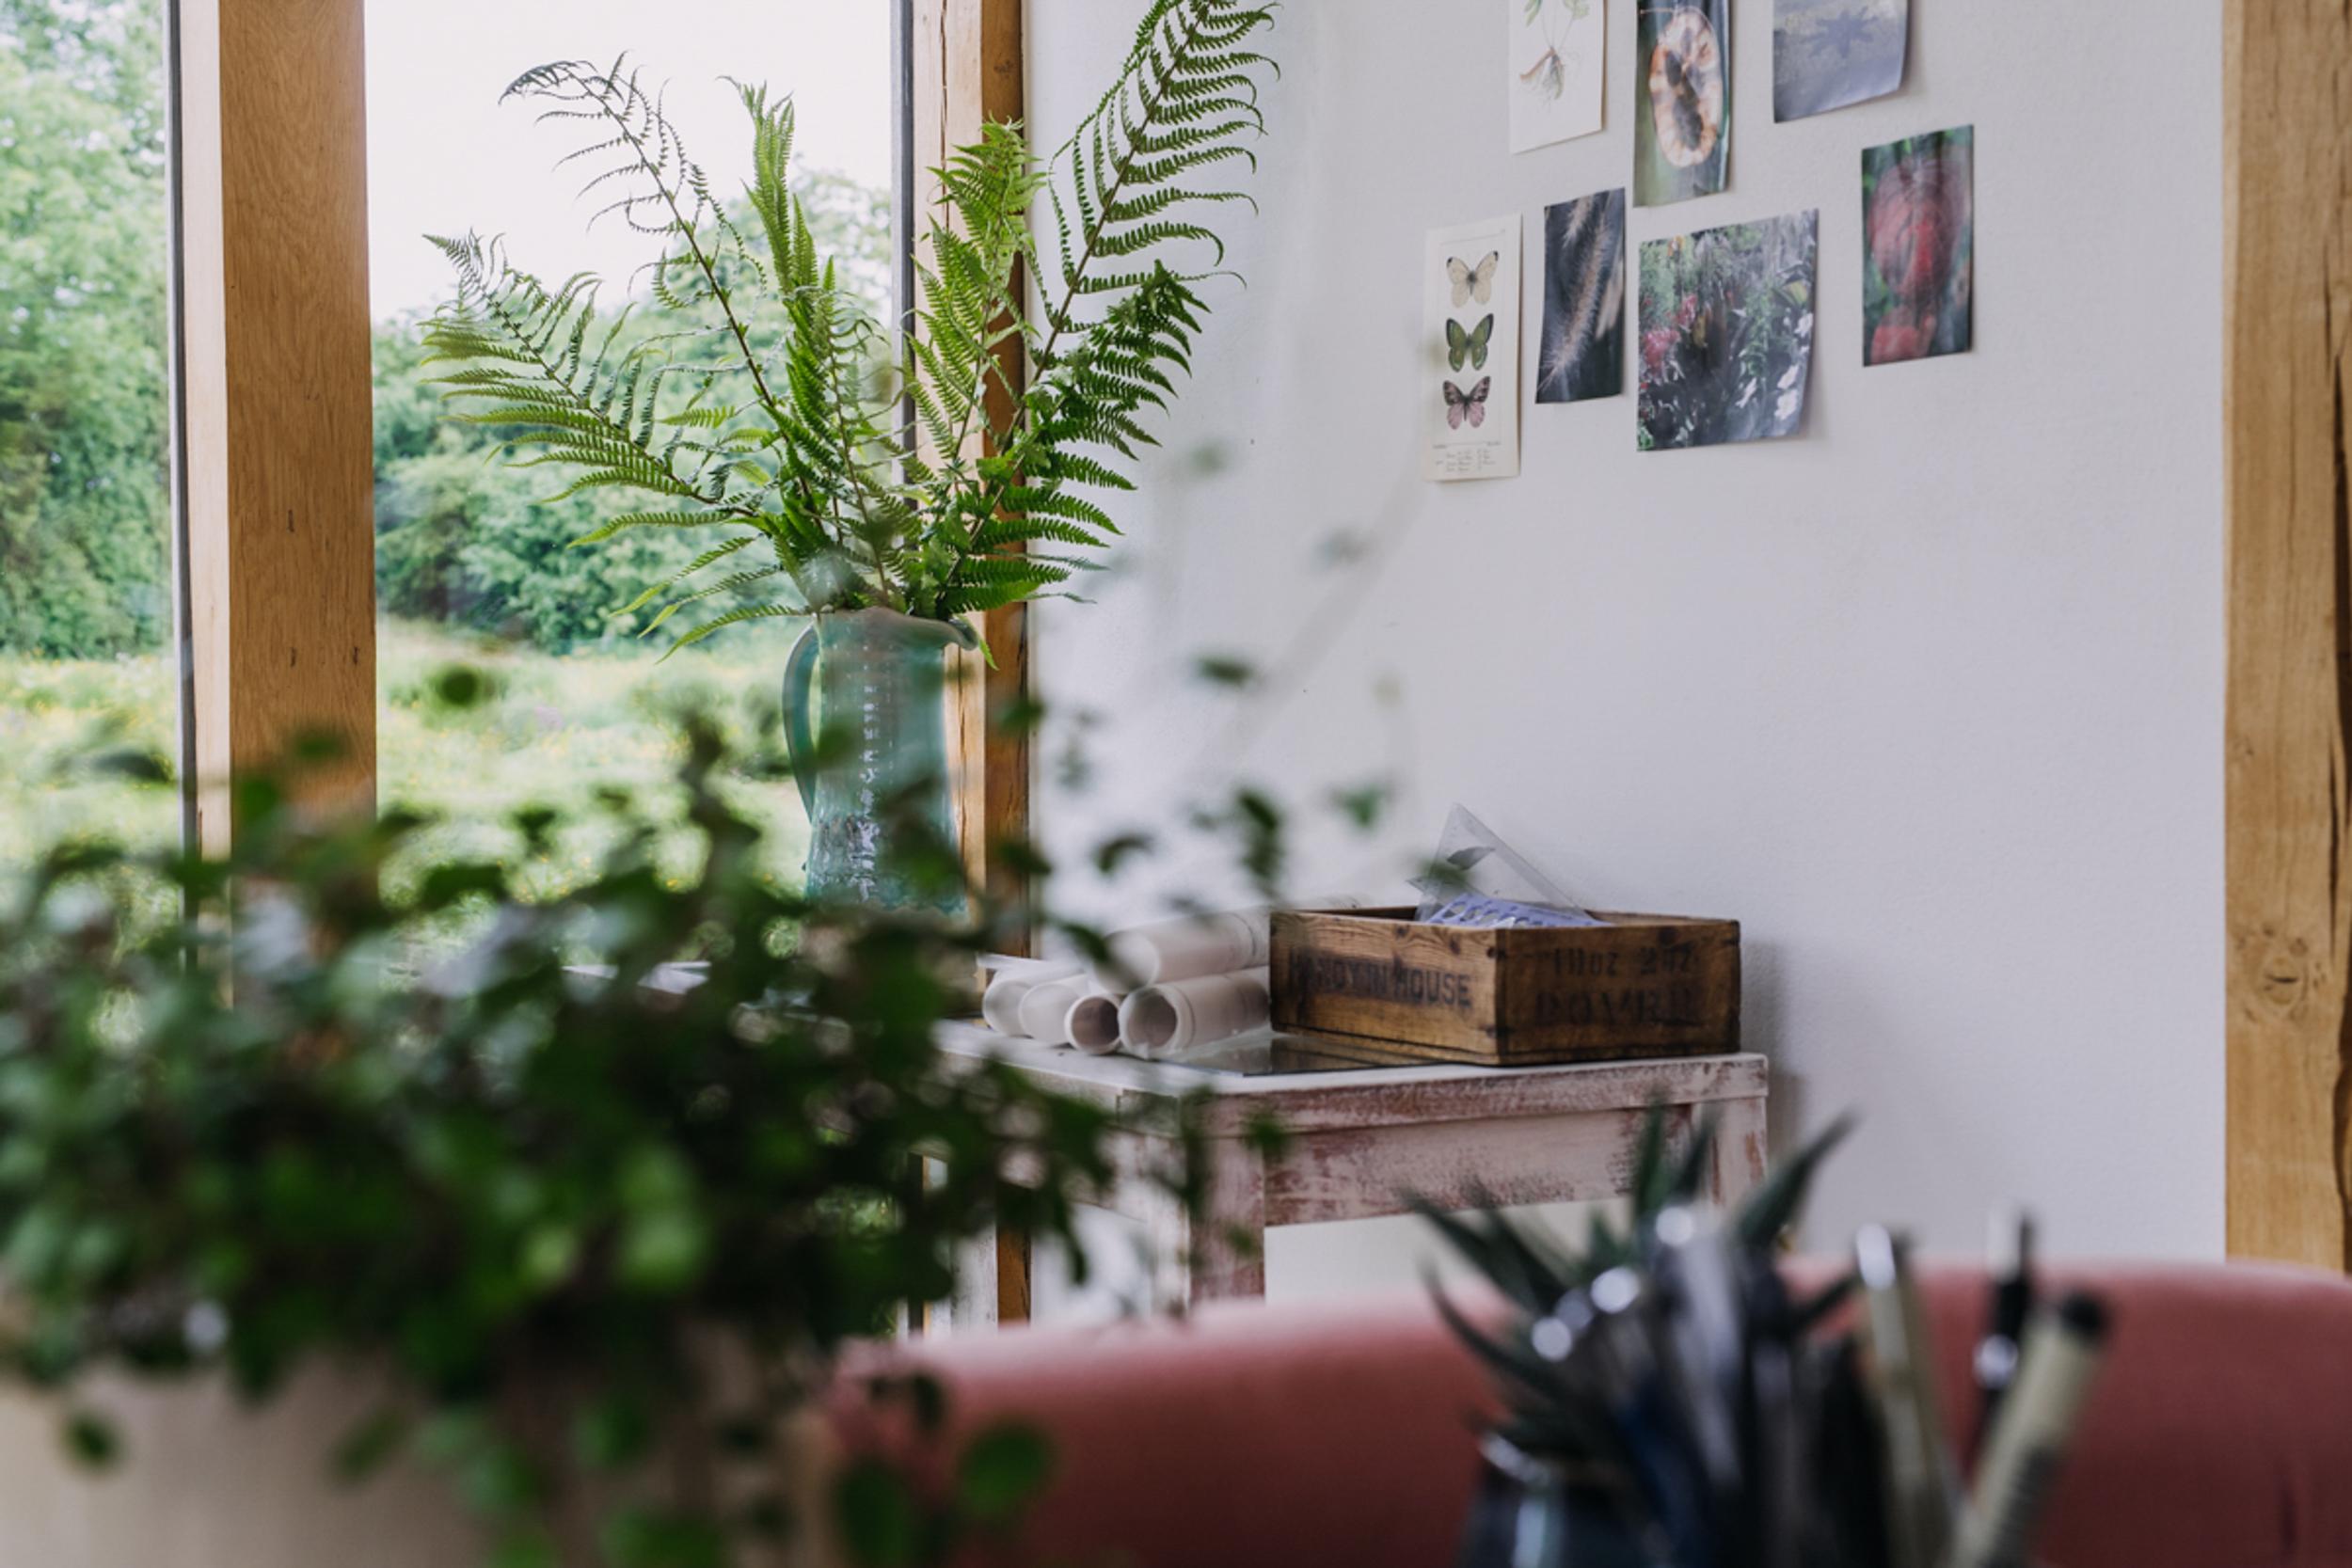 Growthfully brand photography by Eva Nemeth